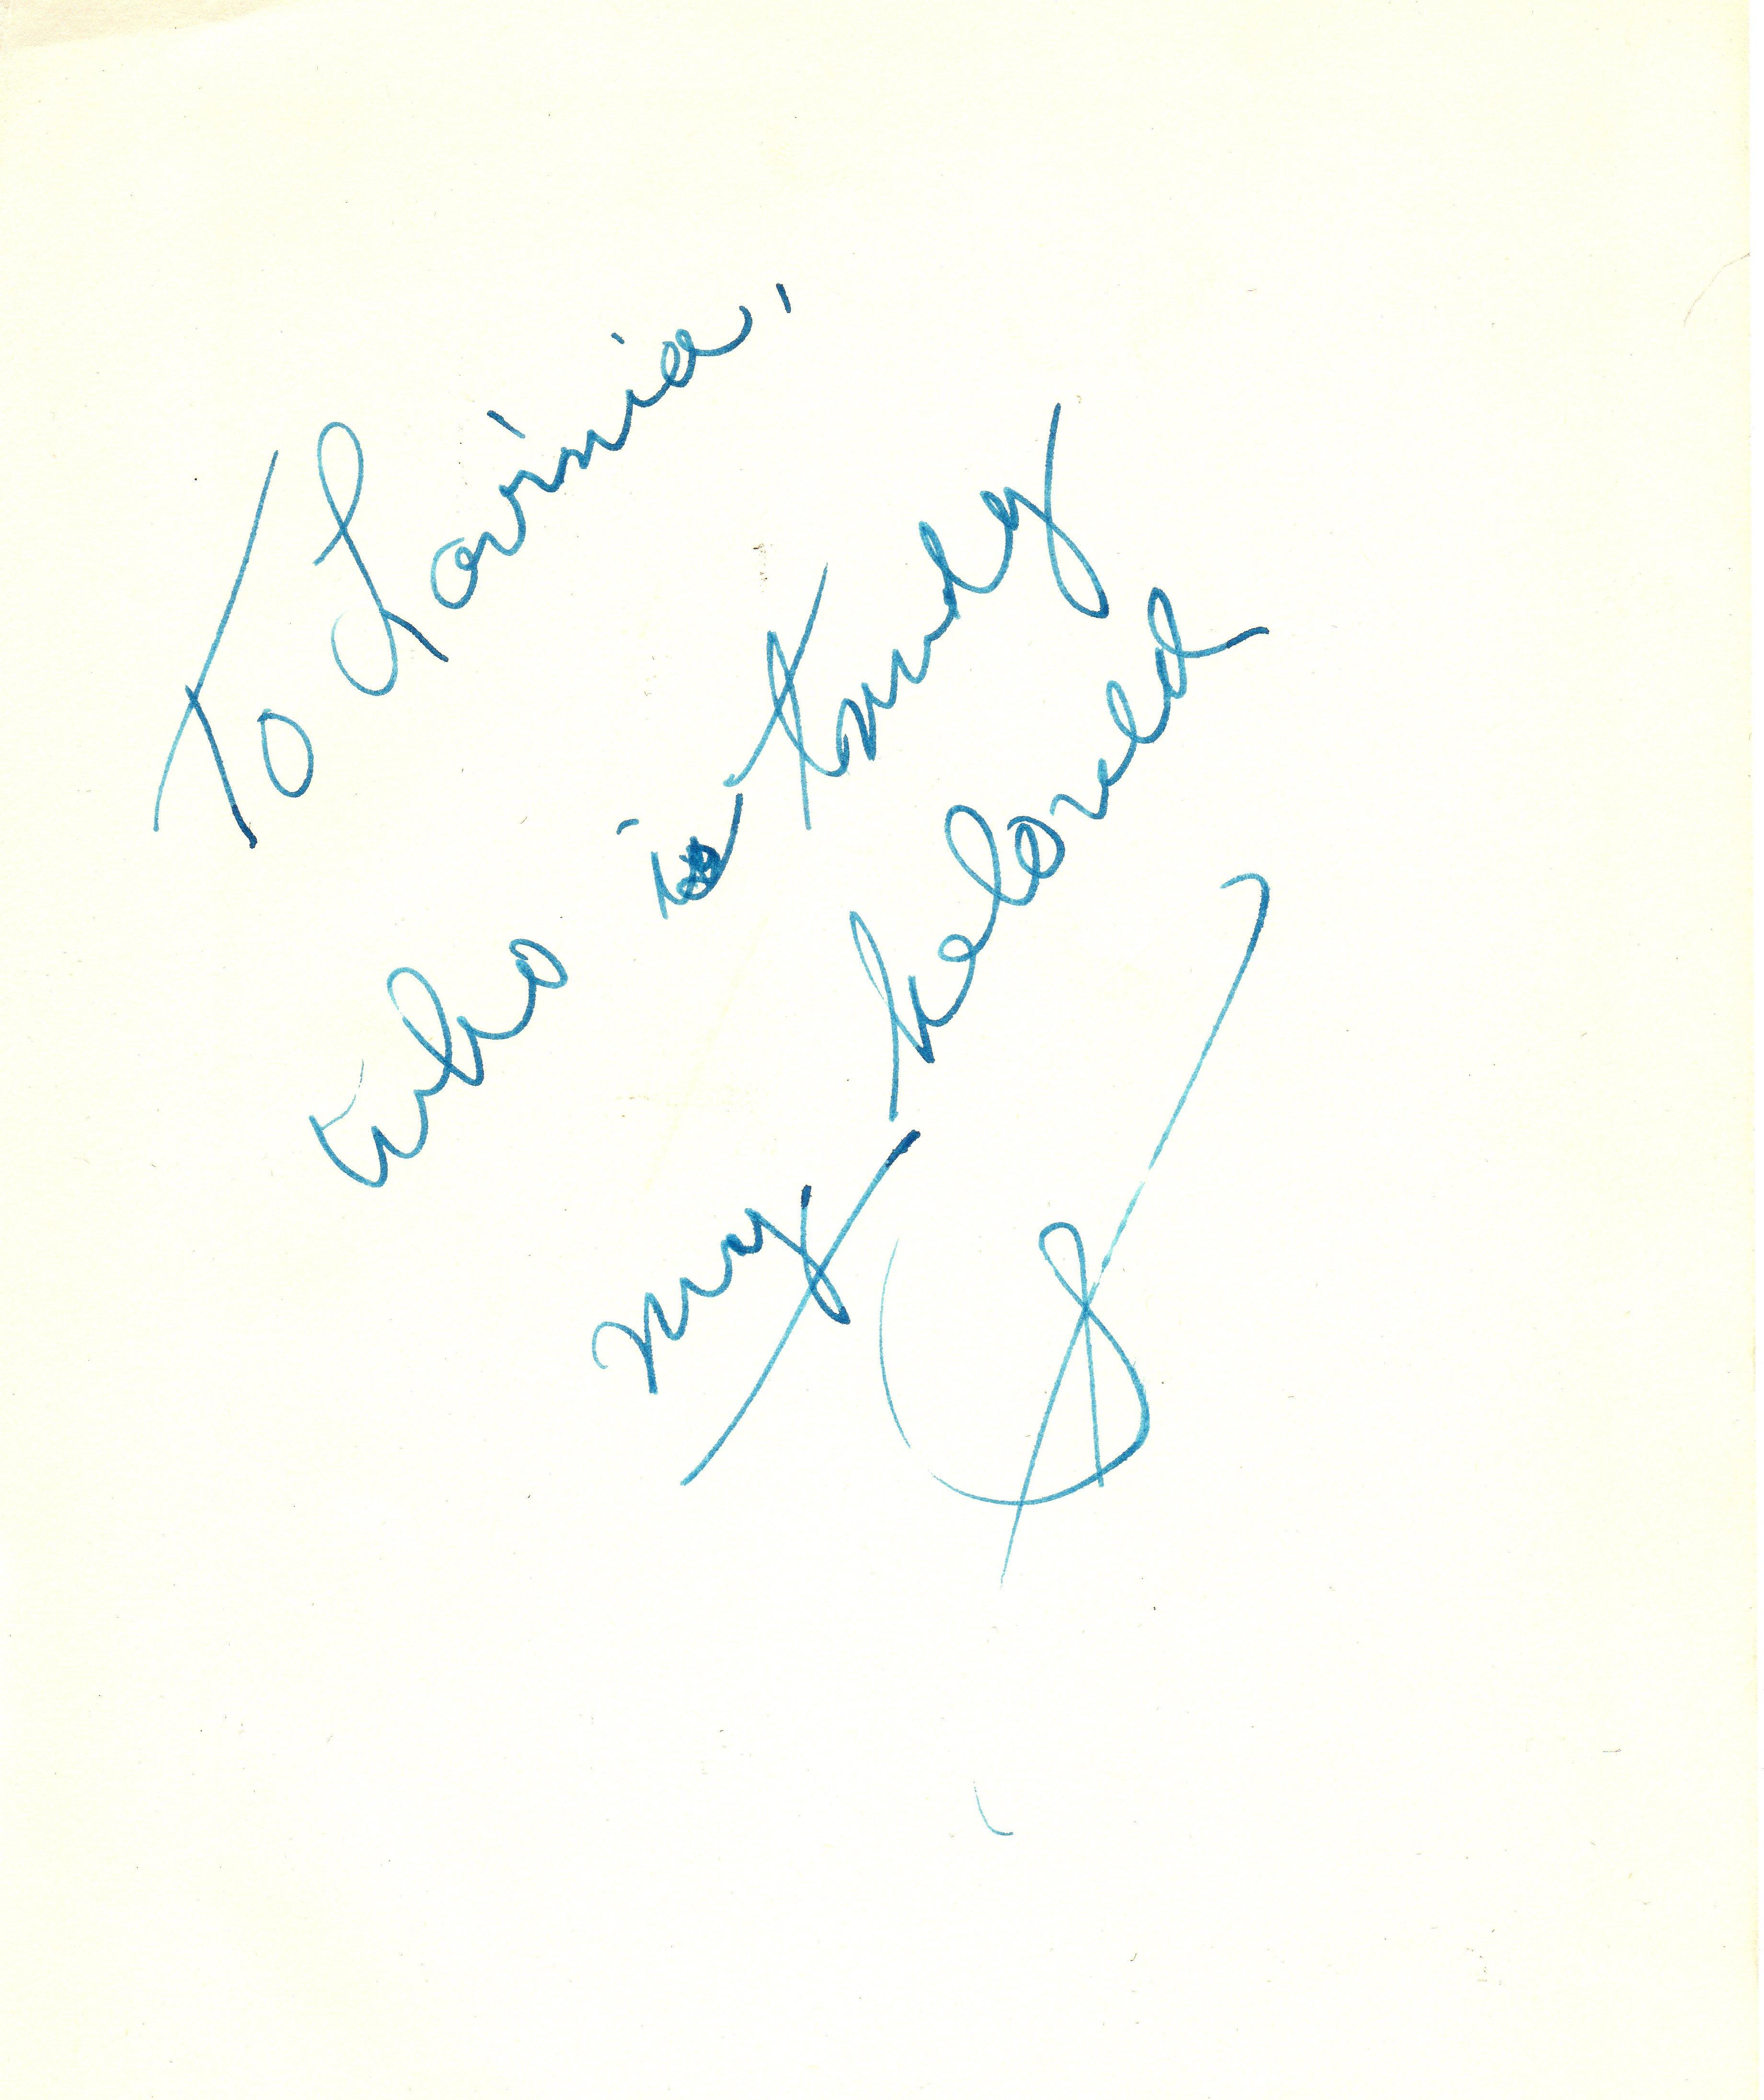 20130200001 - Sinatra Note to Lavinia